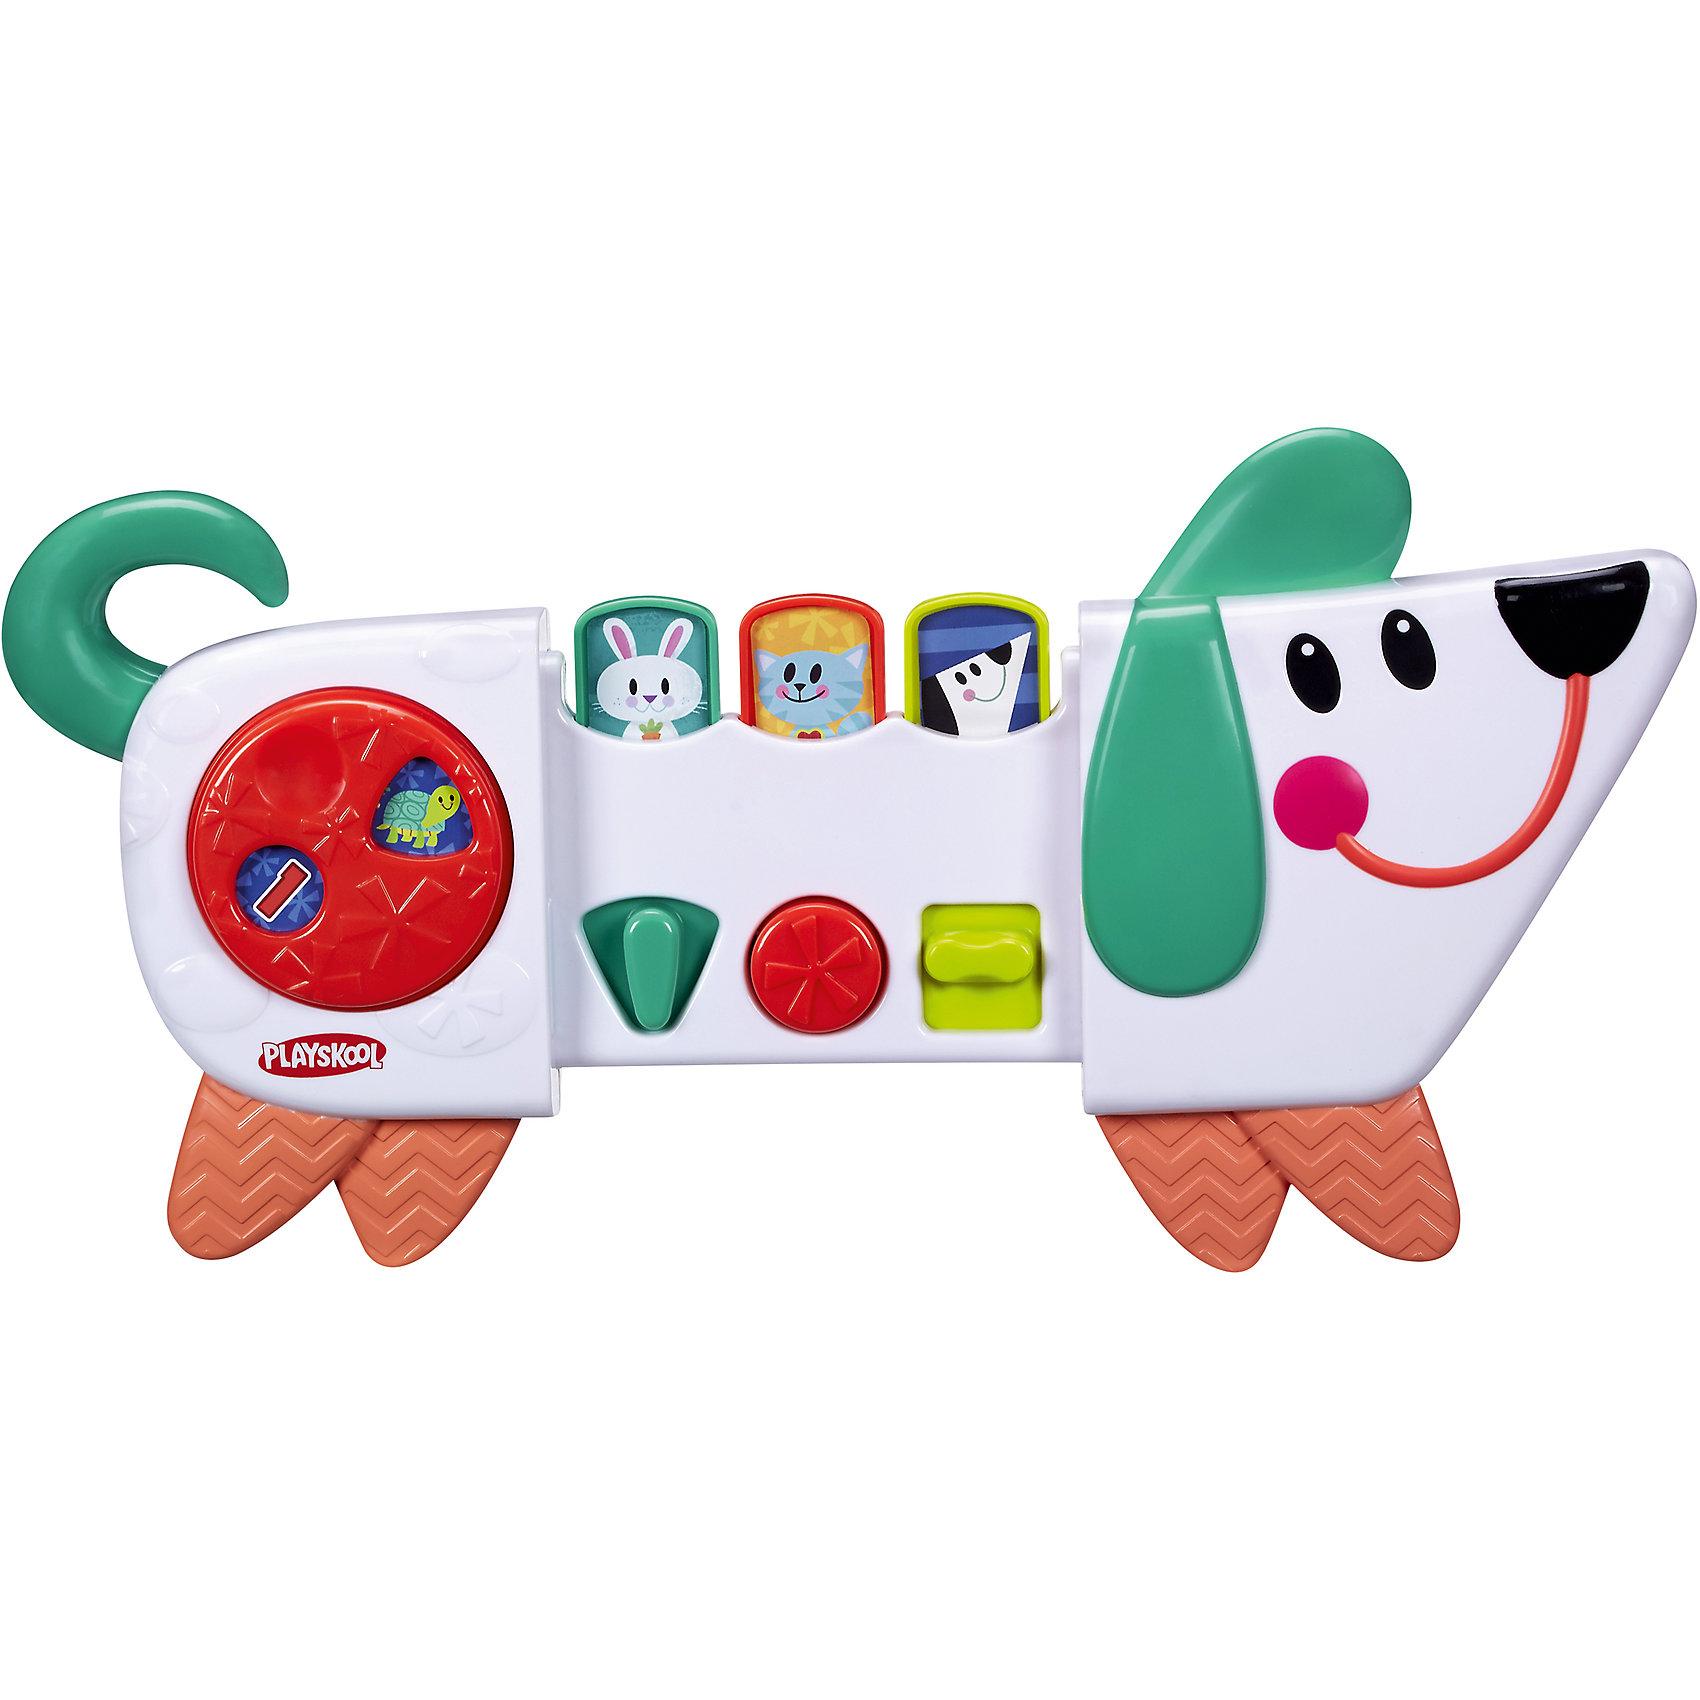 Hasbro Веселый щенок возьми с собой, PLAYSKOOL развивающая игрушка hasbro playskool возьми с собой веселый щенок